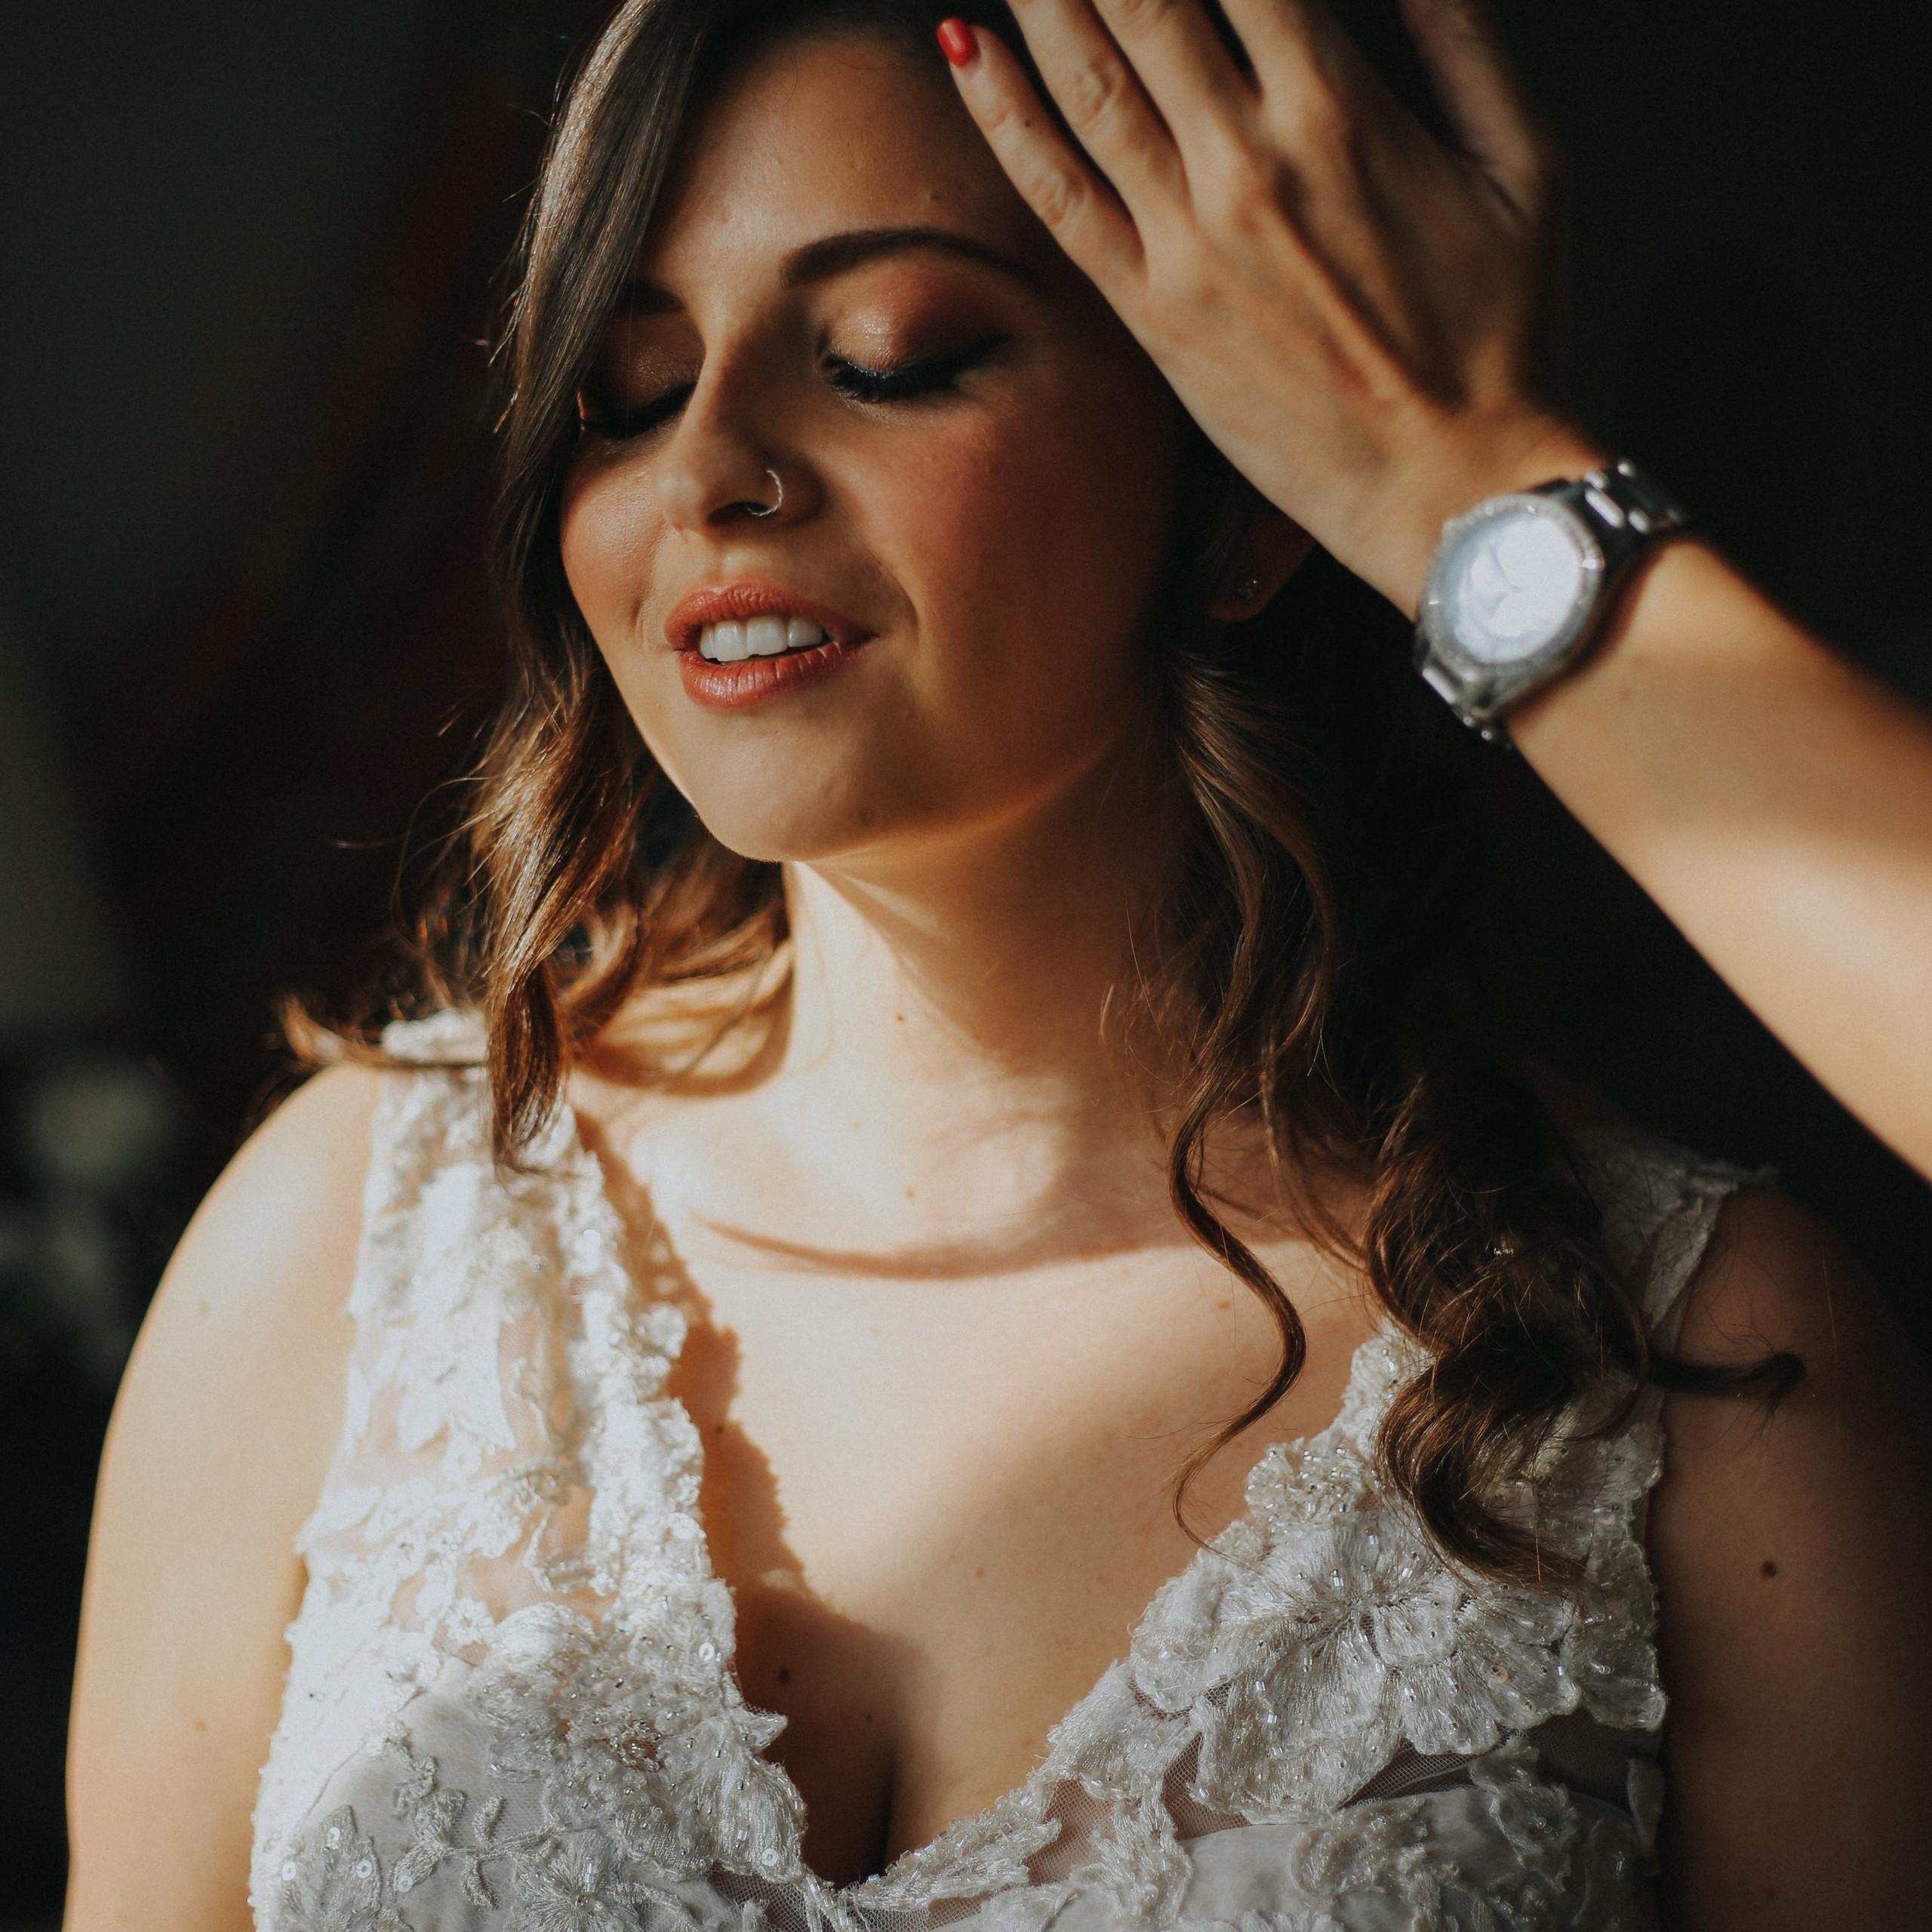 Portrait of bride at final moments of wedding preparation at Wadhurst Castle